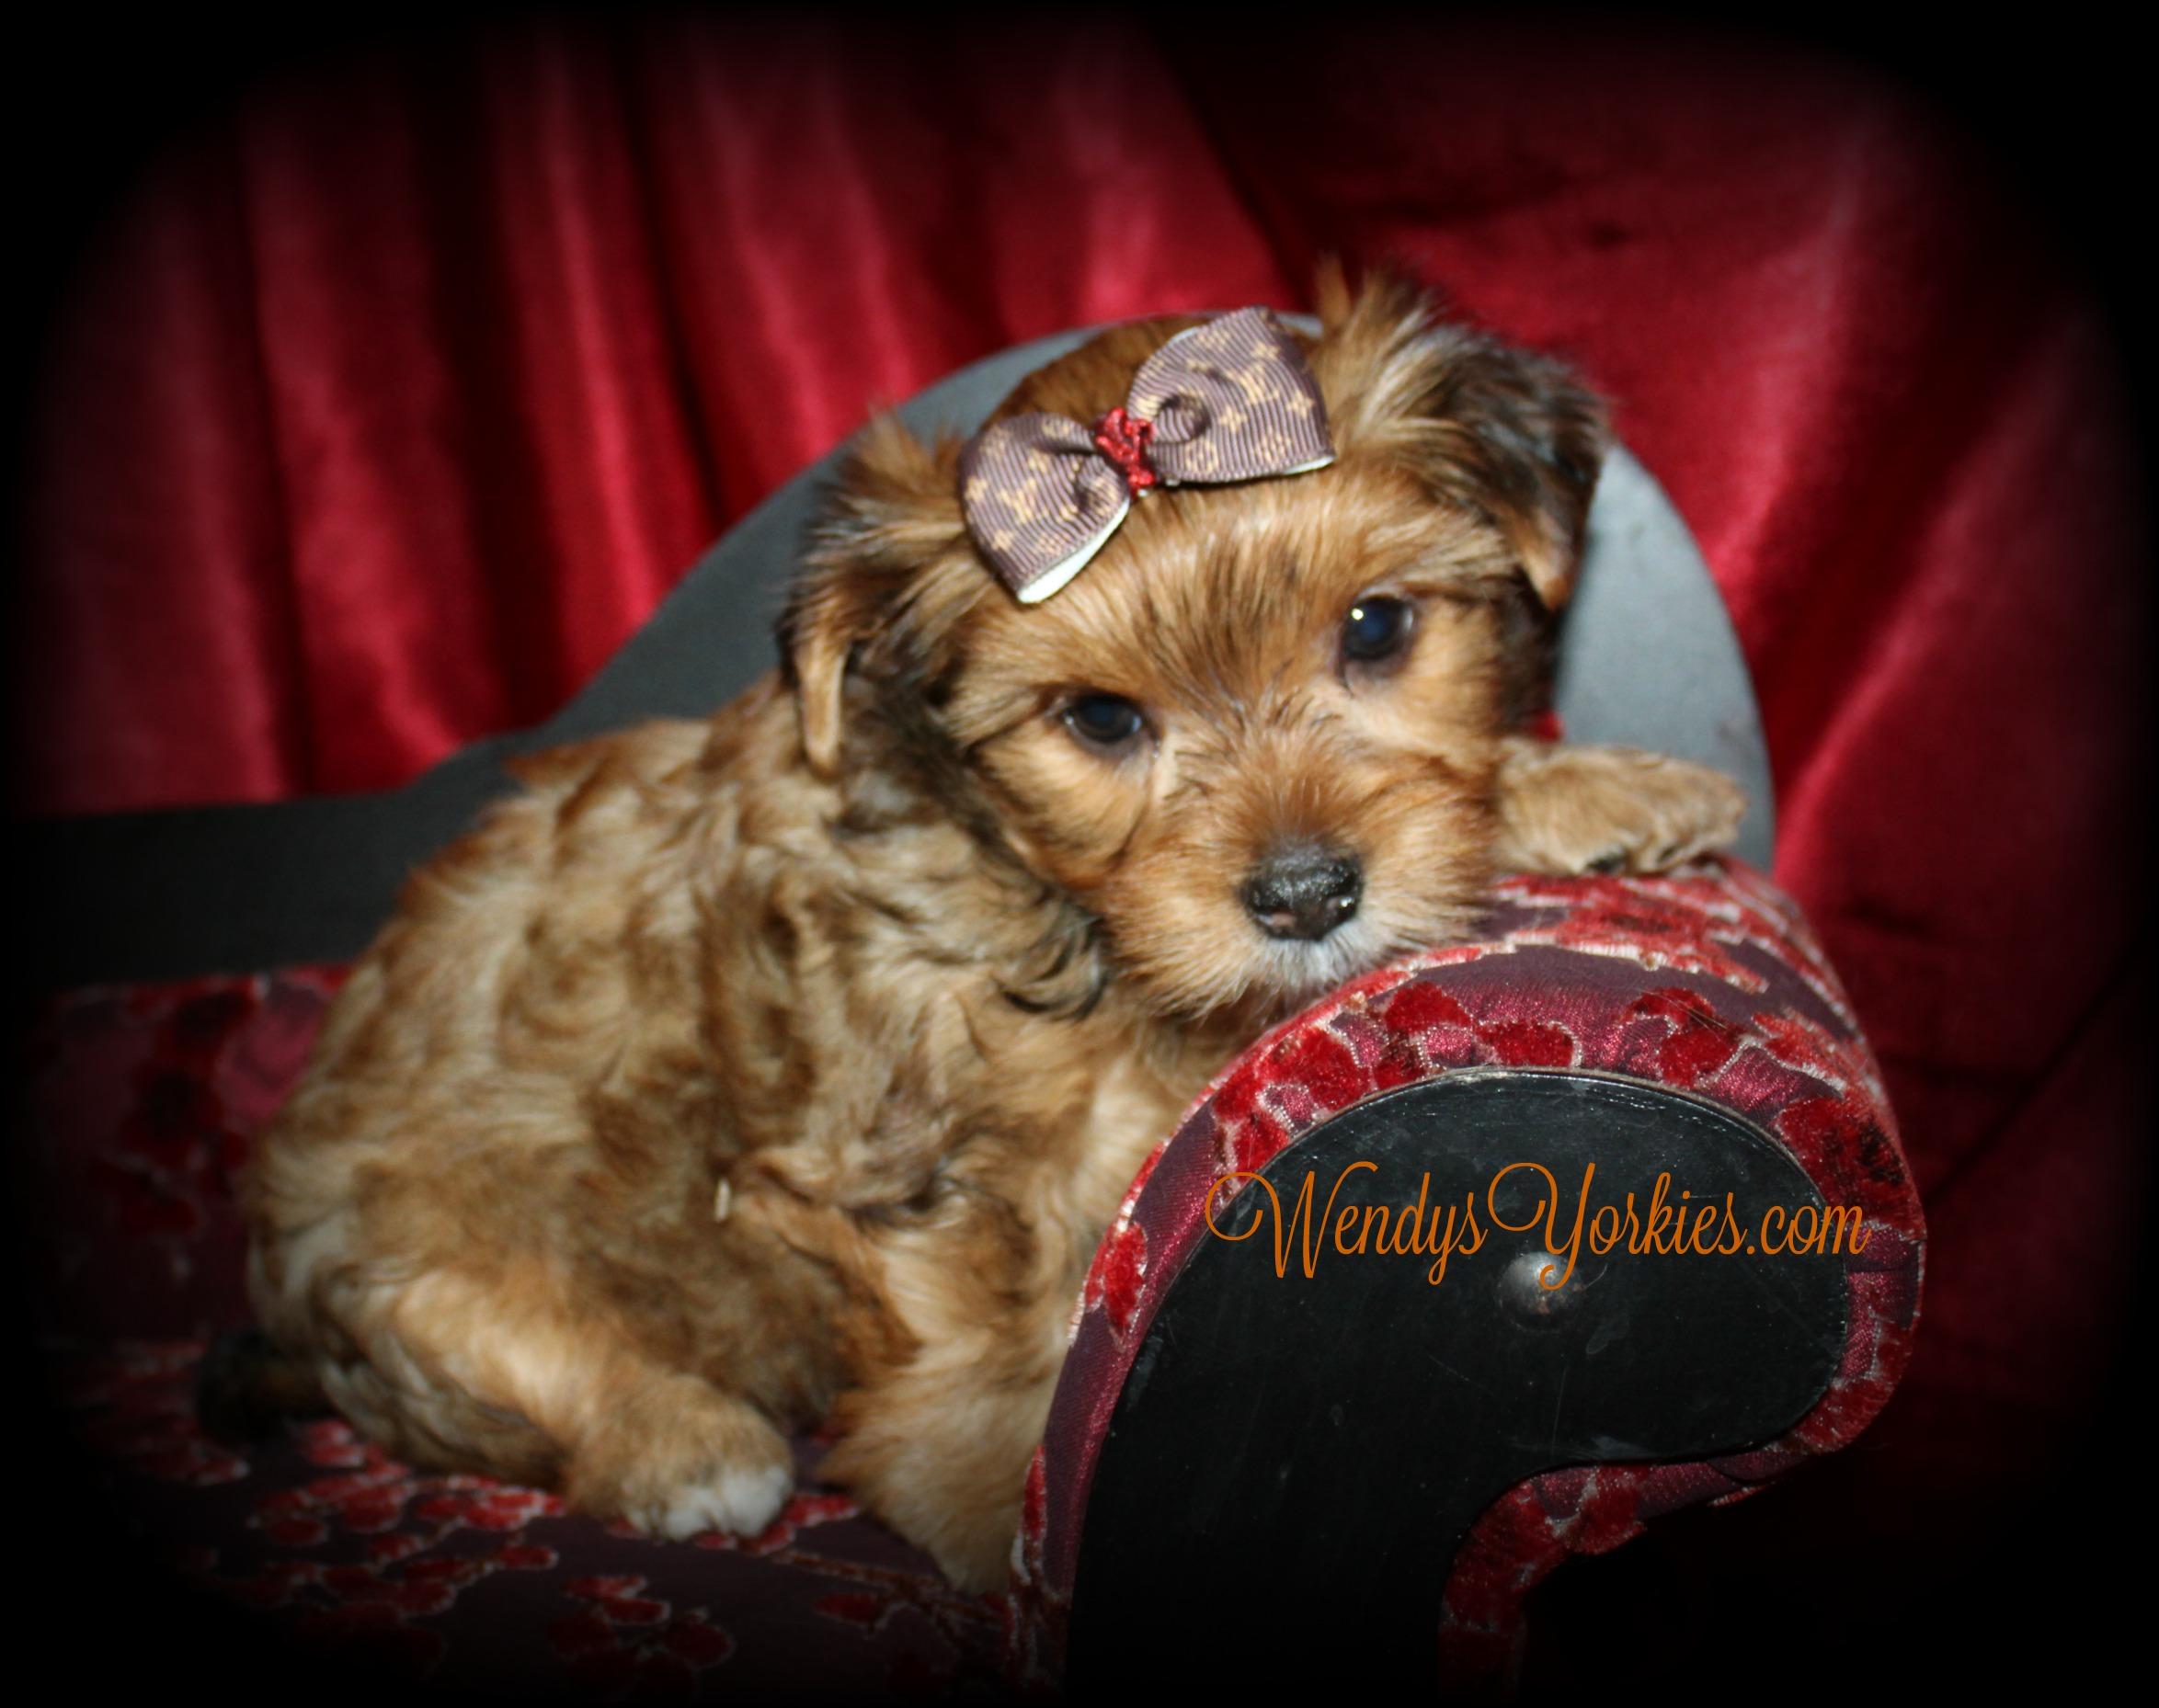 YOrkie puppy for sale, Reese f1,WendysYorkies.com